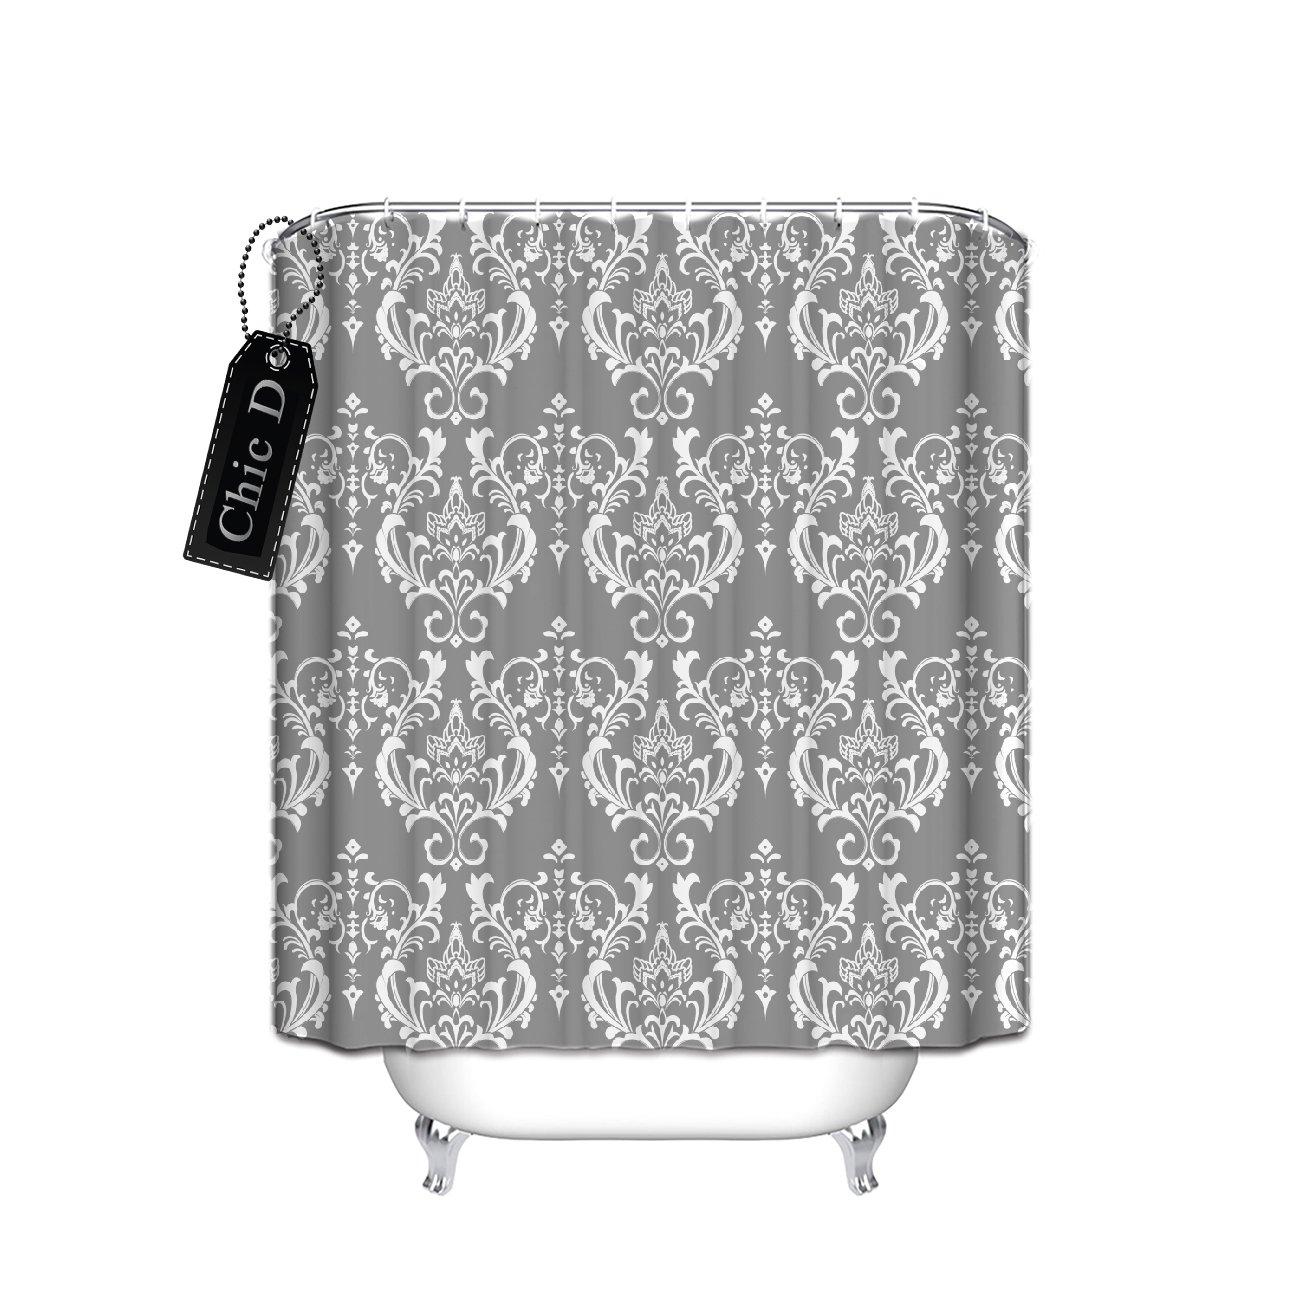 Grey Damask Waterproof Mildew-Resistant Fabric Shower Curtain Extra Long 72x84 Inches Home Bathroom Decorative Fleur de Lis Theme Chic D